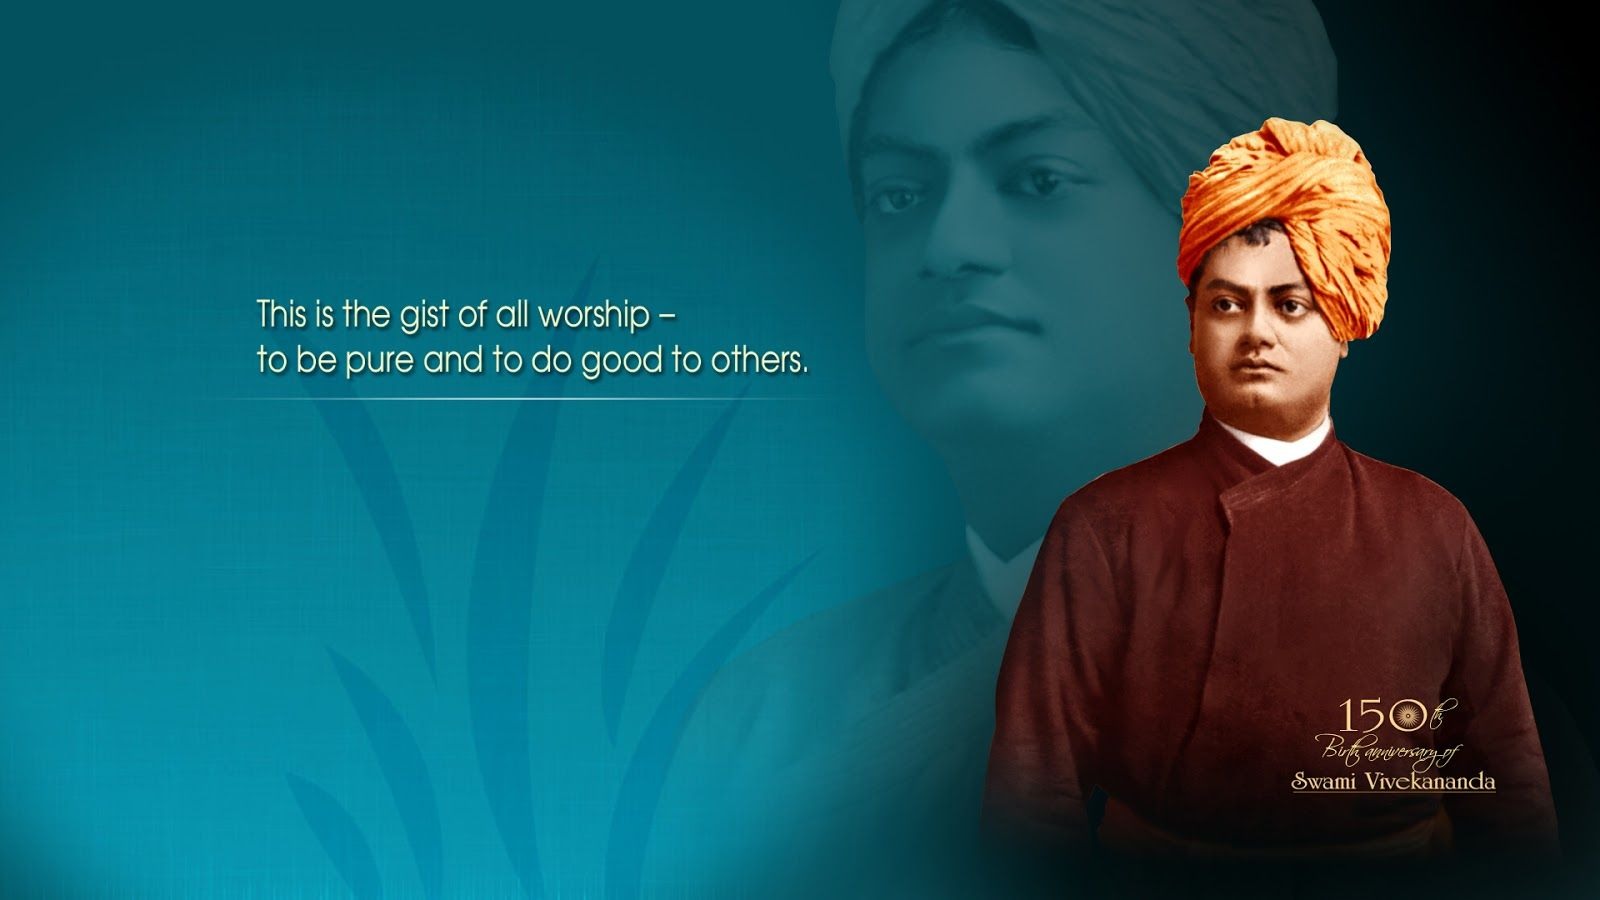 1366x768 Swami Vivekananda HD Wallpapers Download Wallpaper 1600x900